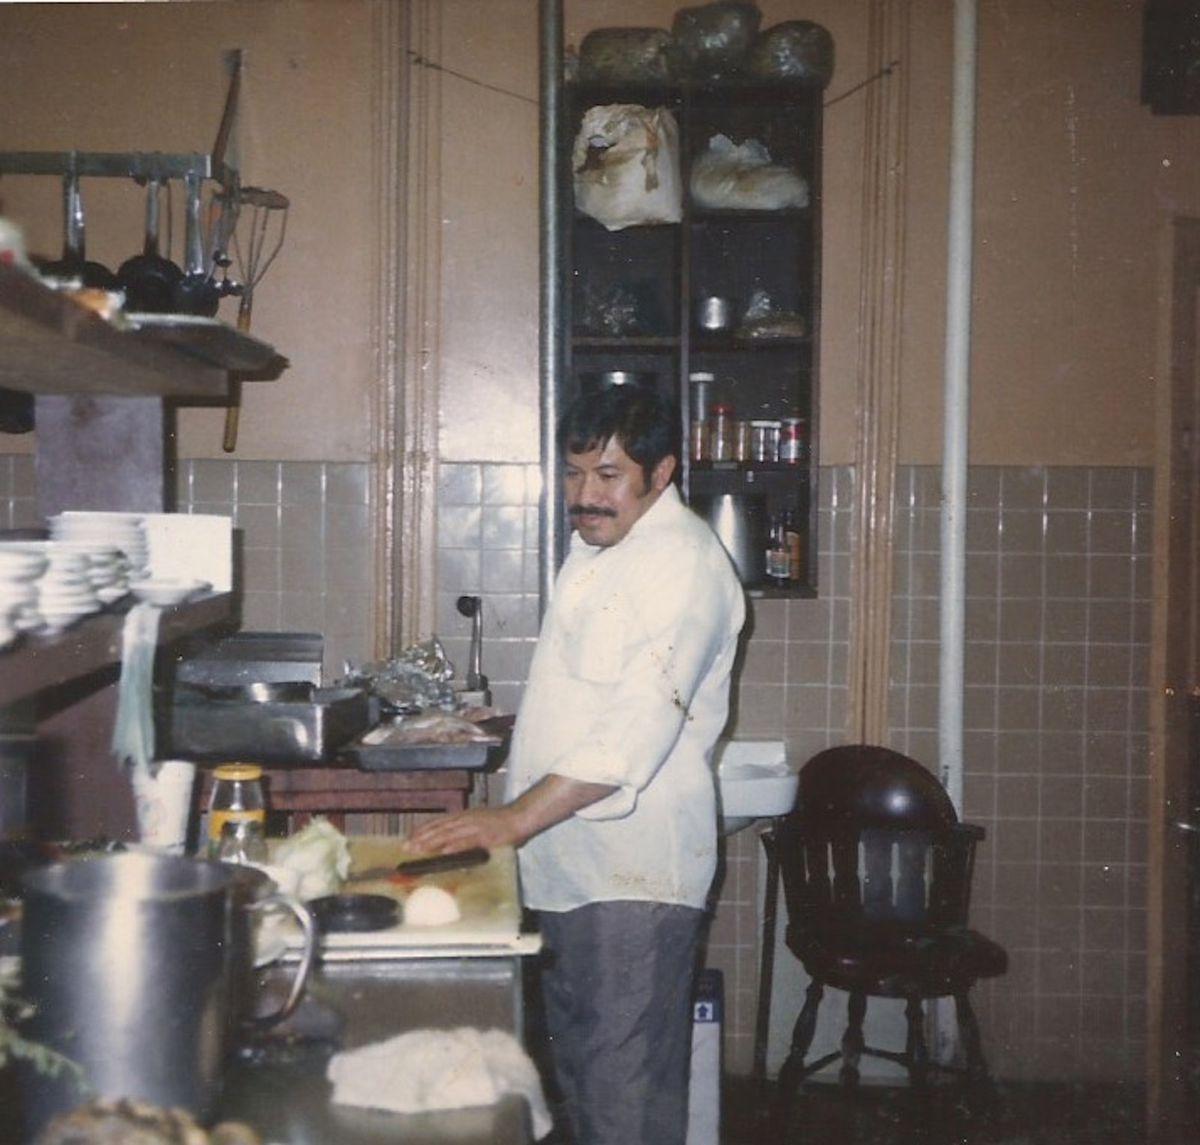 Samuel Linares in the kitchen at his restaurant, La Casa de Samuel.